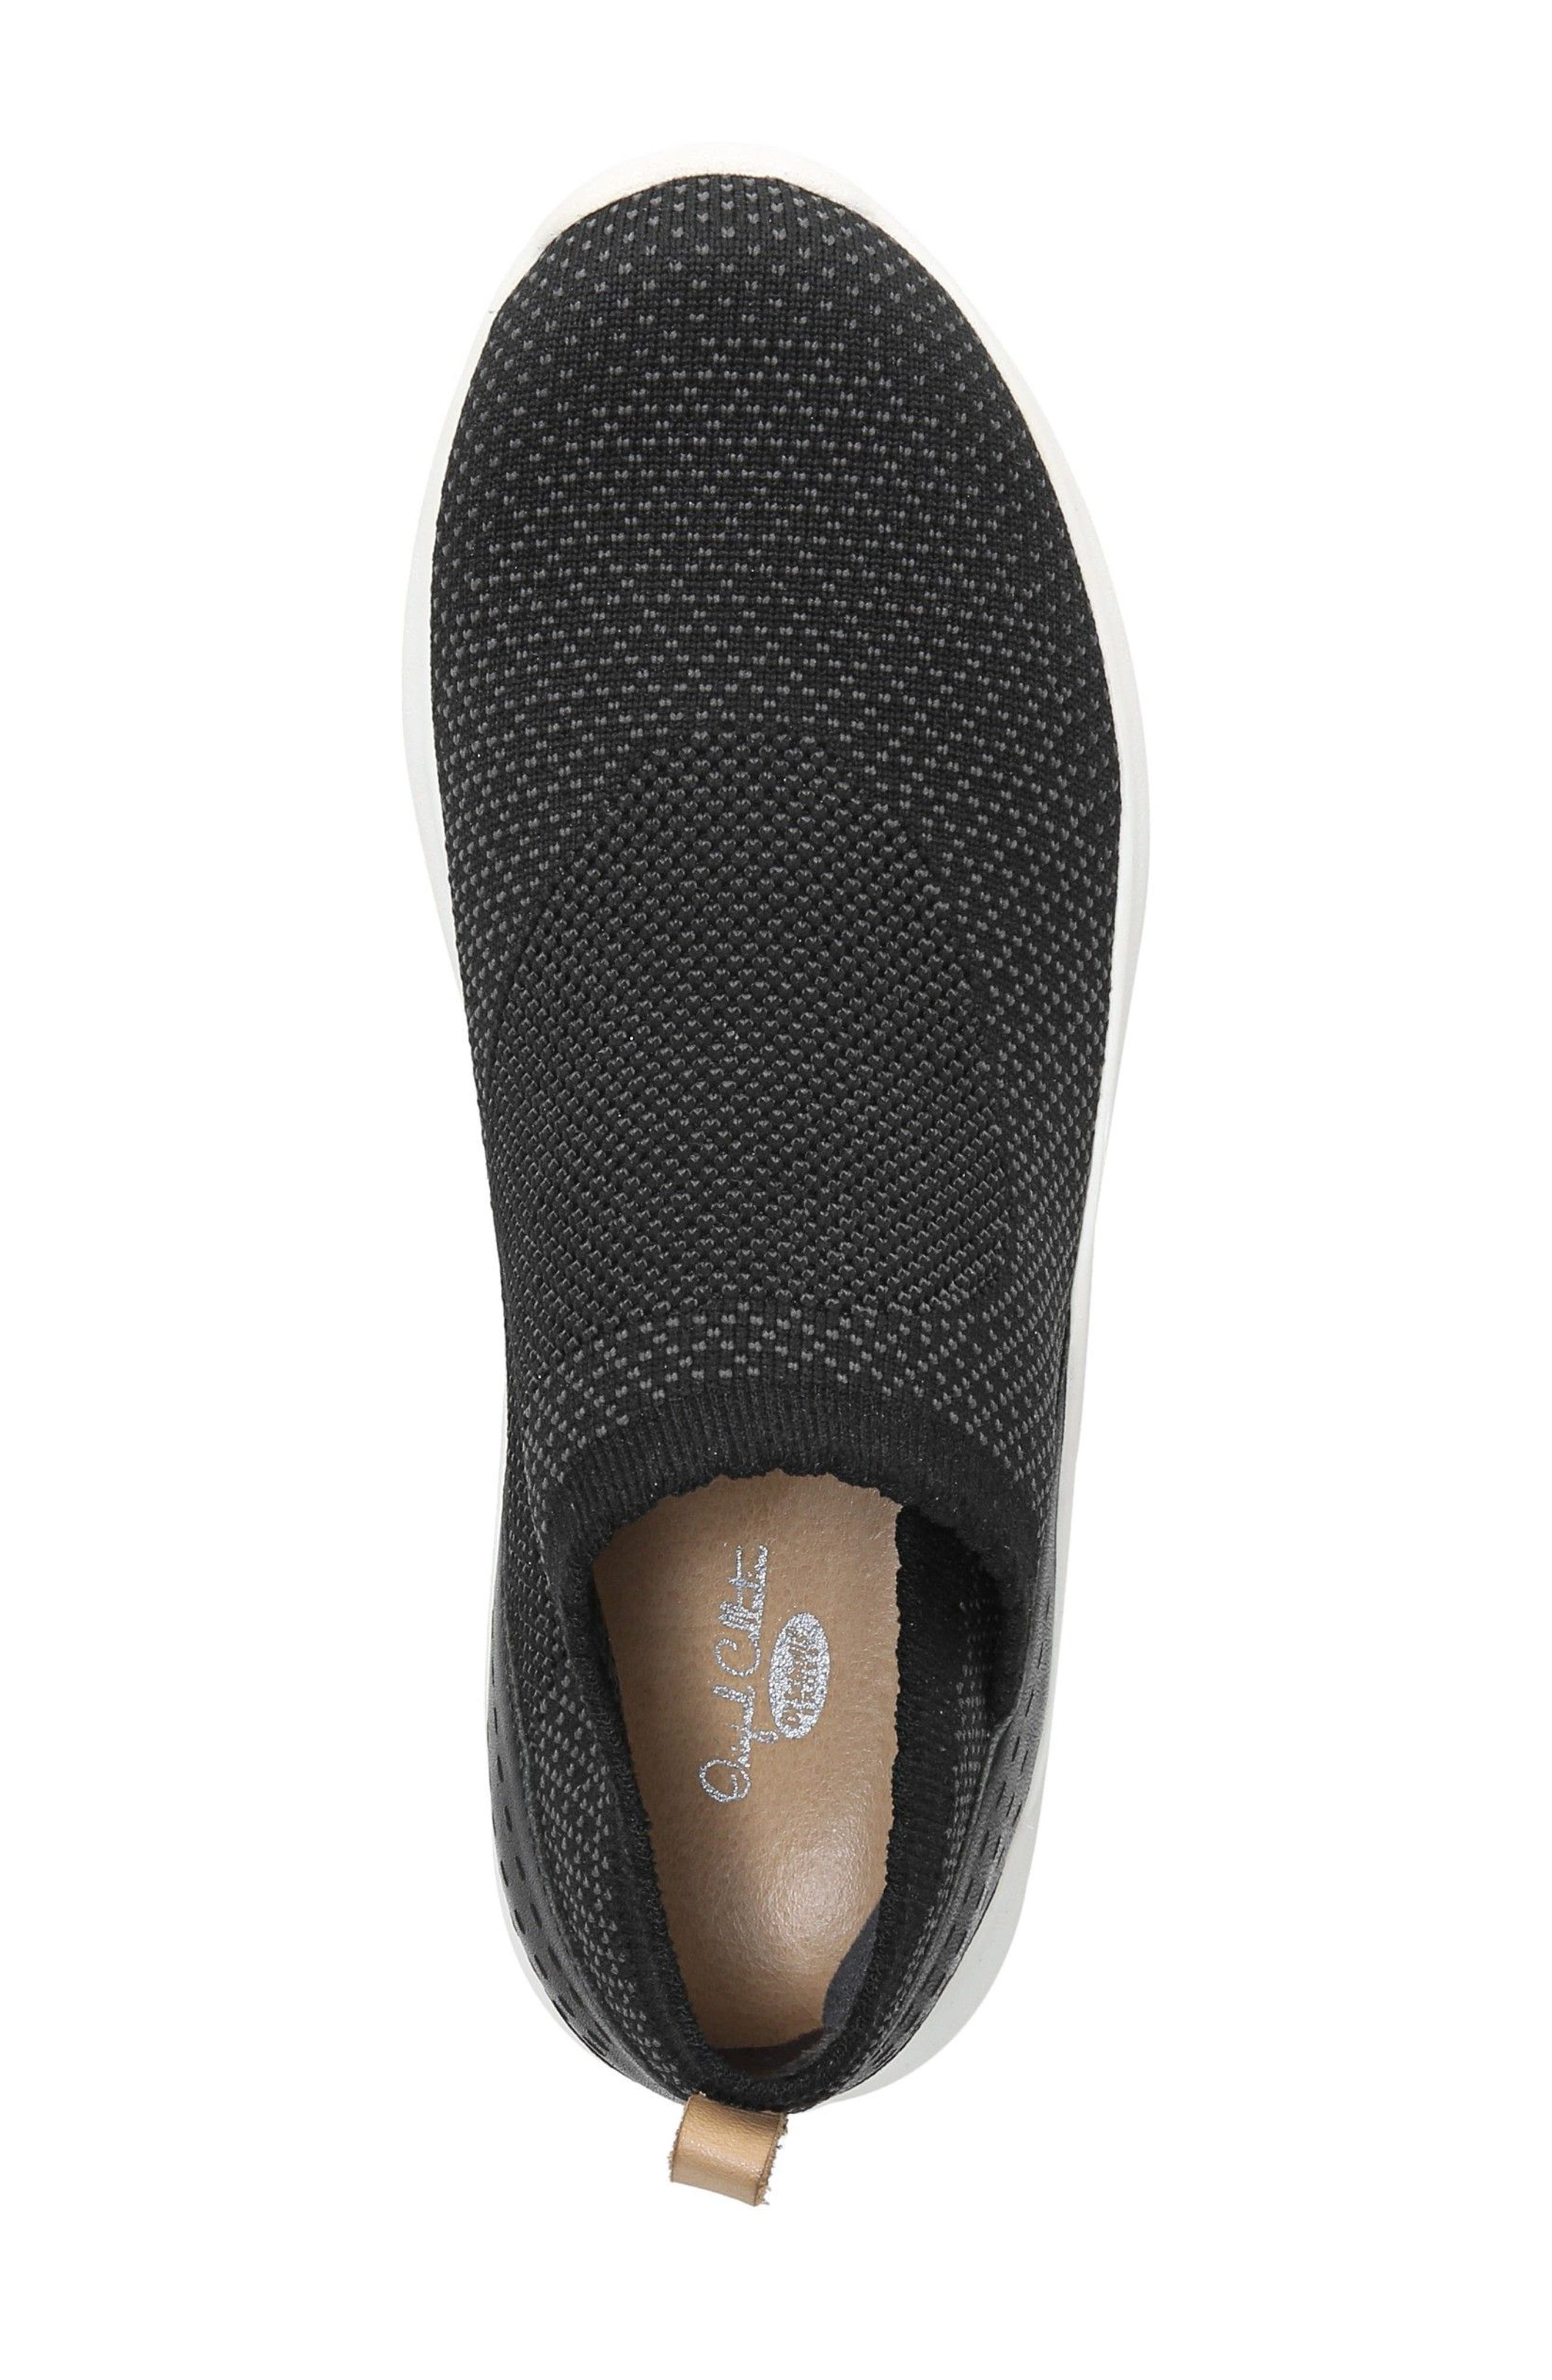 Fierce Knit Slip-On Sneaker,                             Alternate thumbnail 5, color,                             BLACK KNIT FABRIC